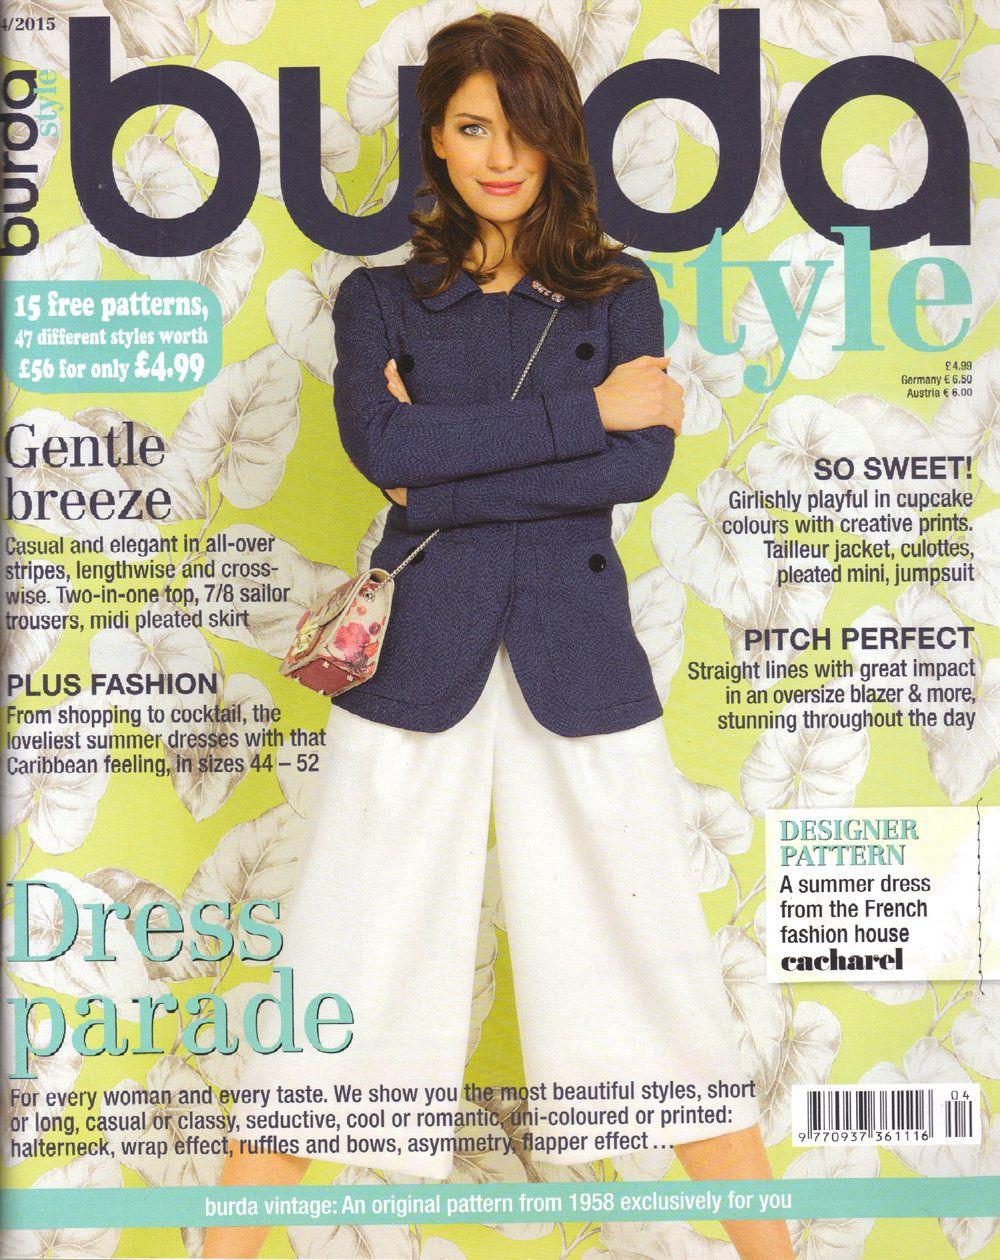 Burda style magazine 42015 english sewing patterns by burda style magazine 42015 english sewing patterns by honeyjamsuniques on etsy jeuxipadfo Image collections